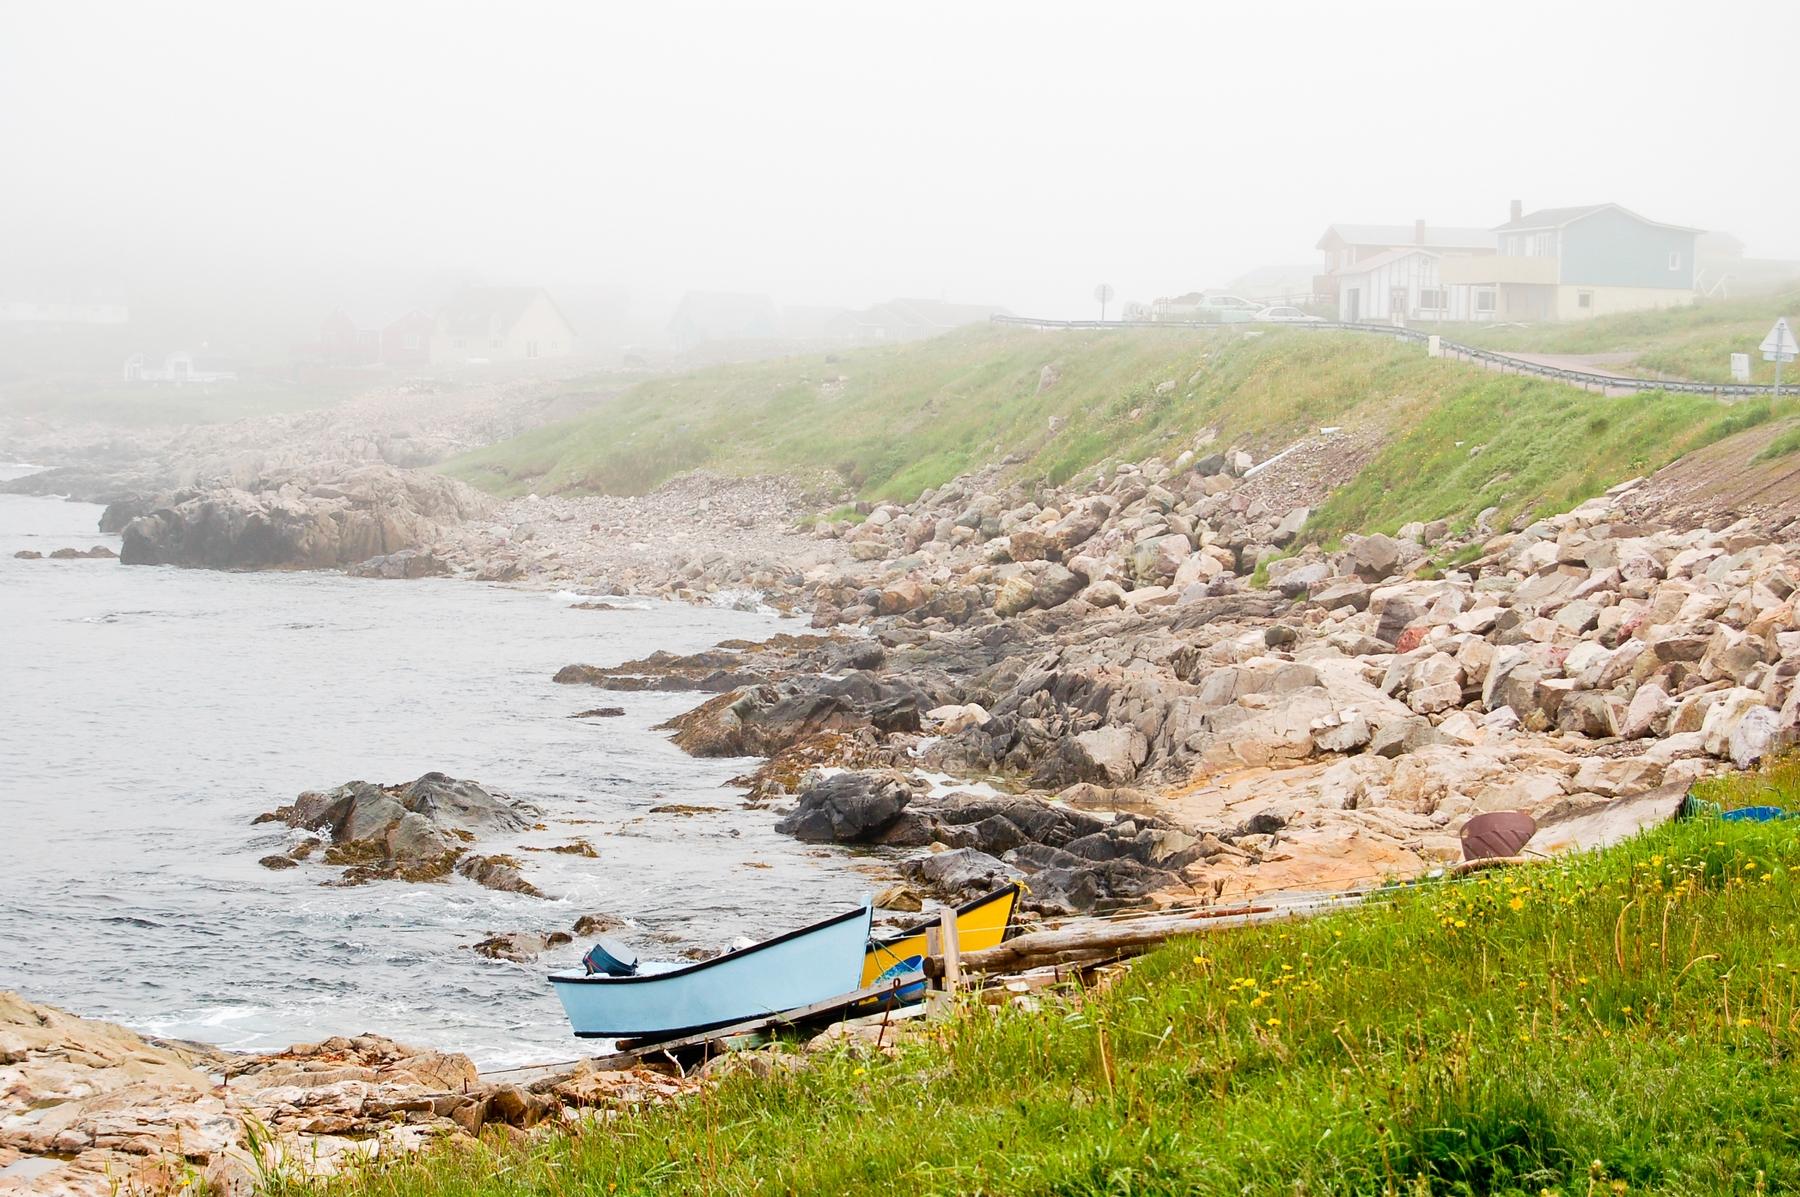 The rocky coastline of Twillingate, Newfoundland, a great October holiday destination